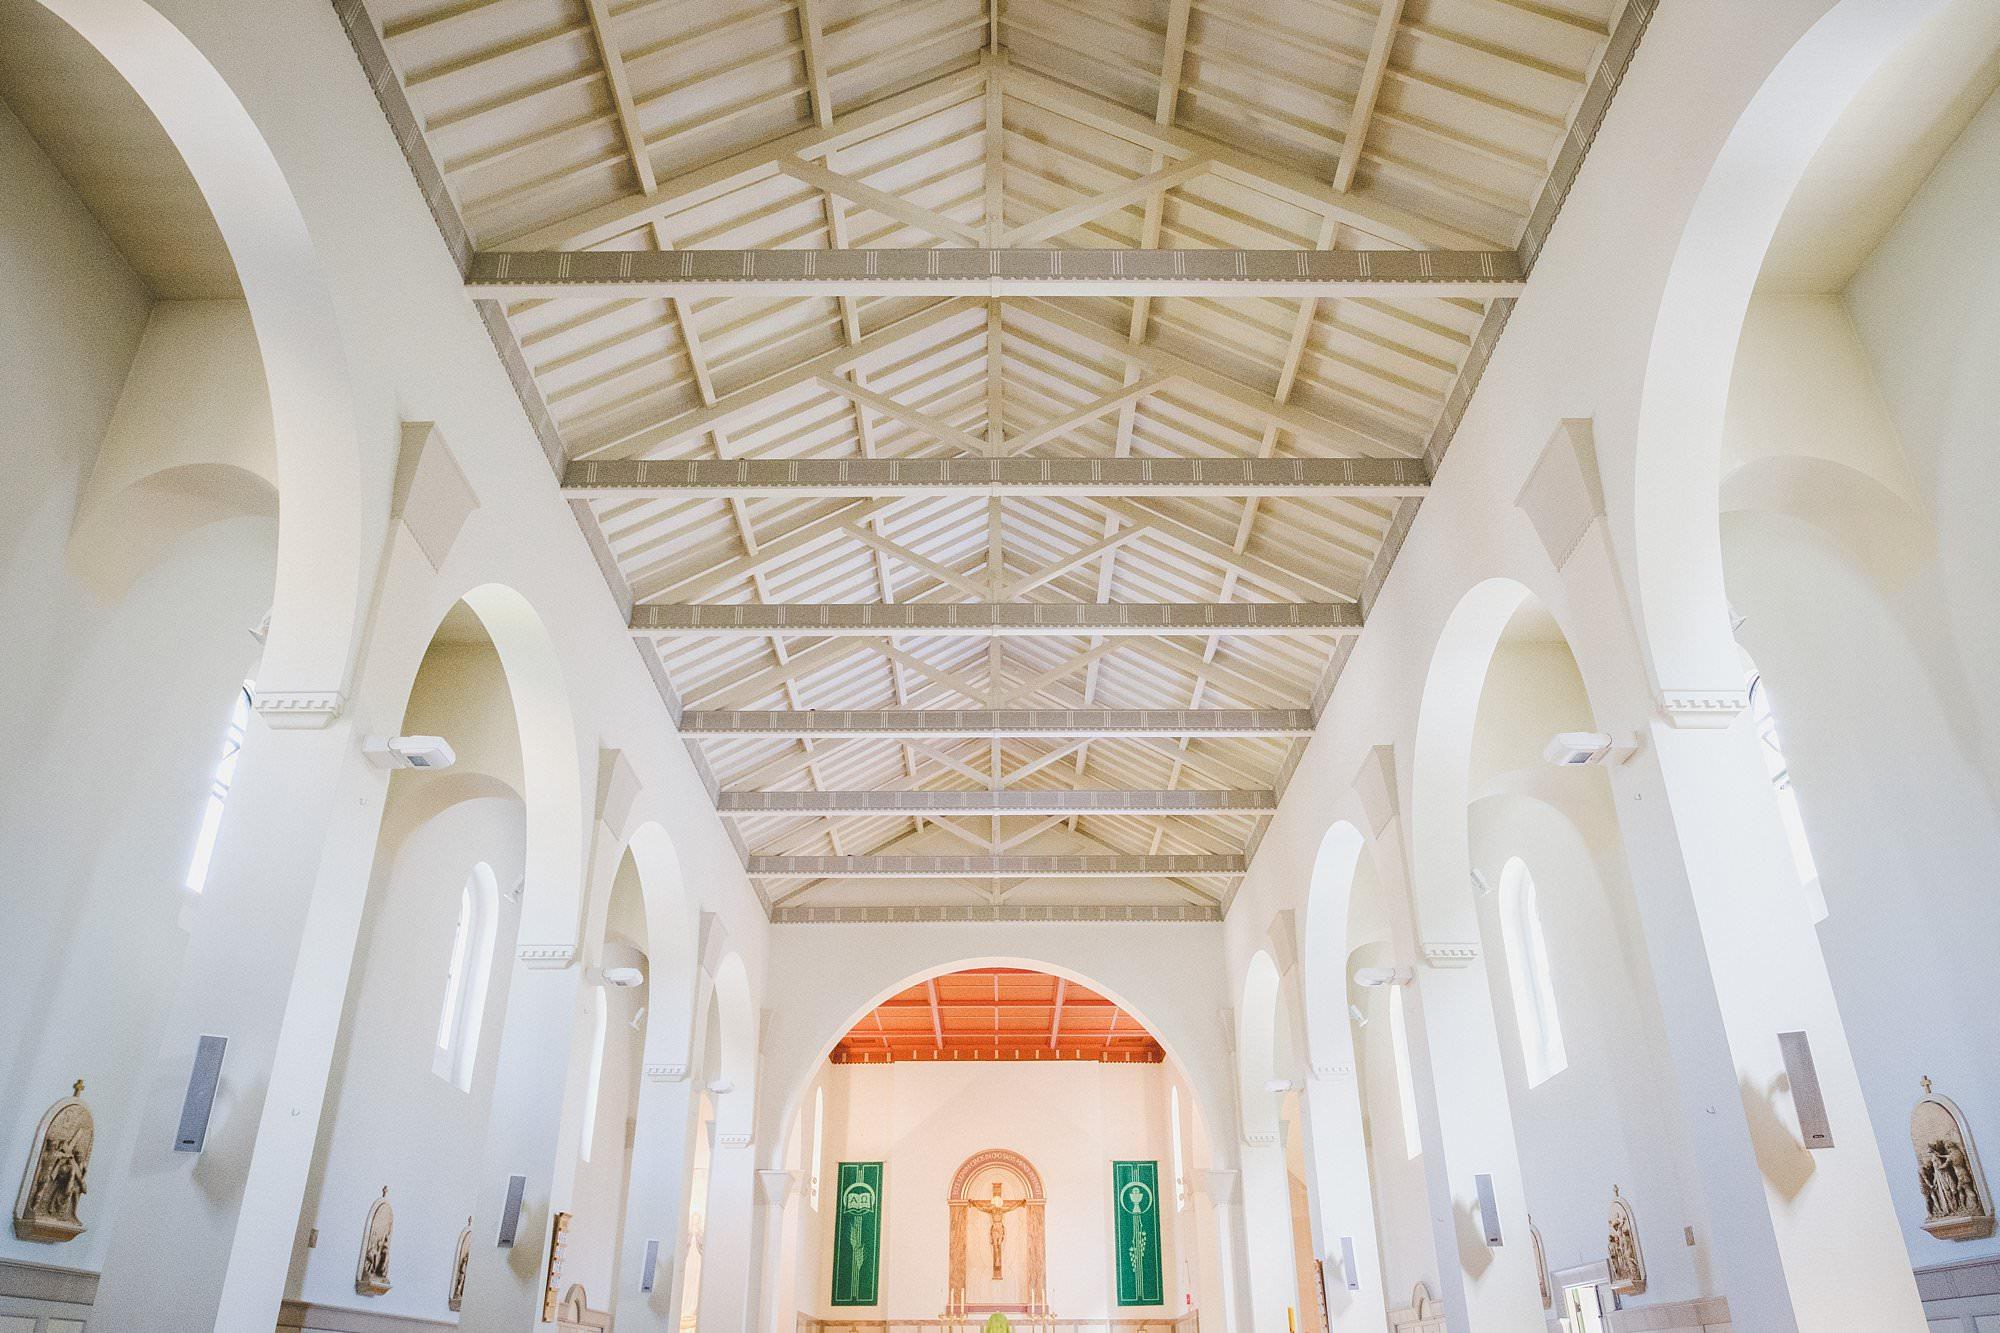 holy cross rc church parsons green wedding photographer 005 - For Couples | Holy Cross Church Wedding Photographer